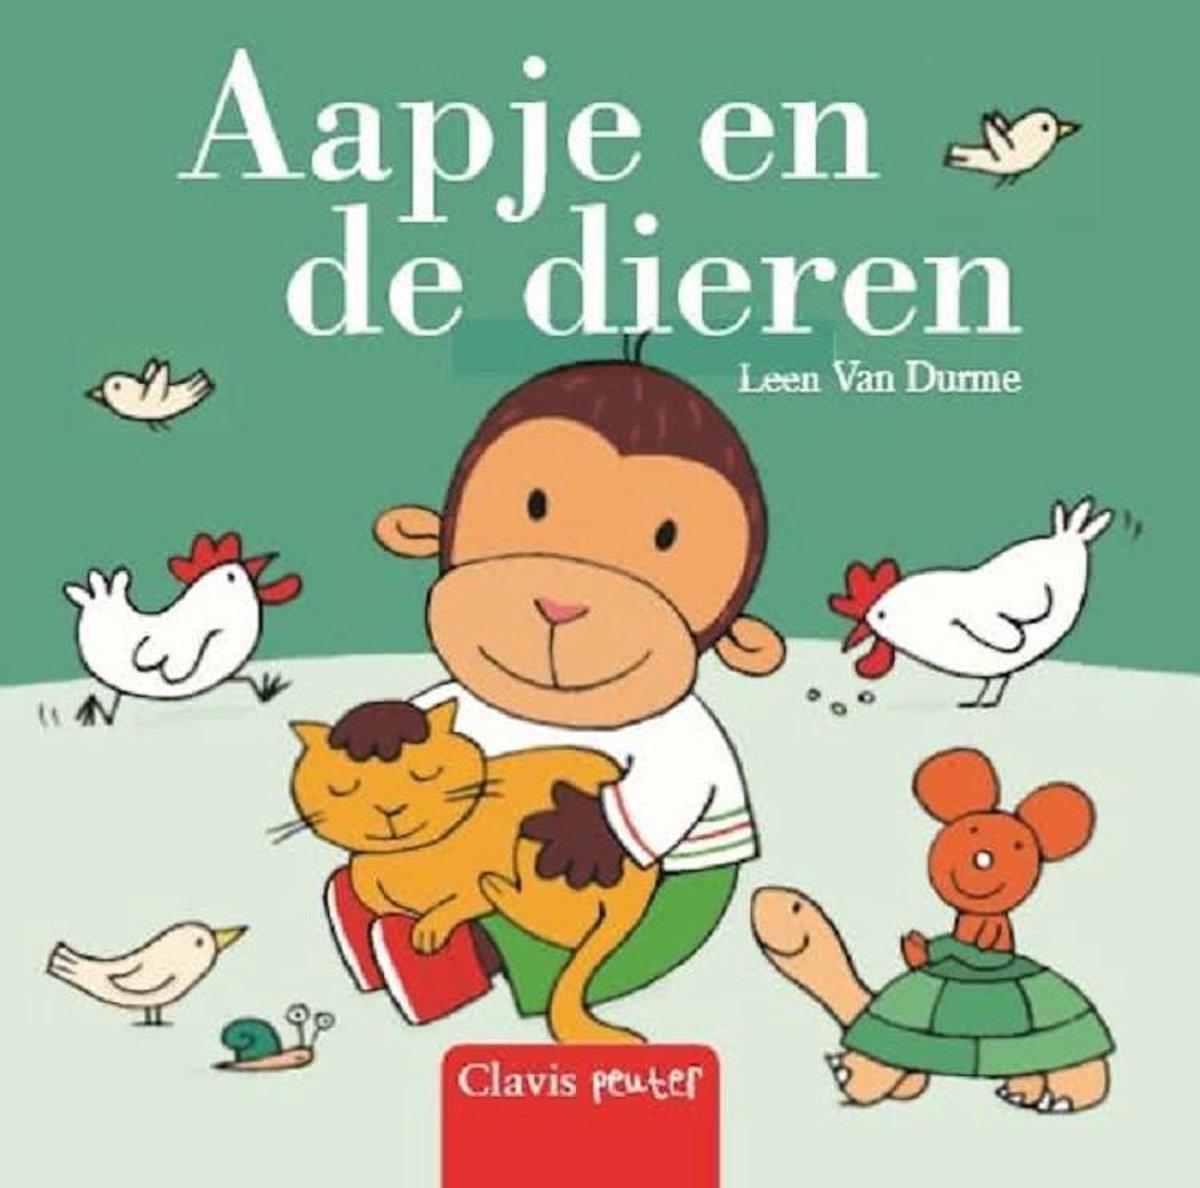 proxis.nl bookspot.nl